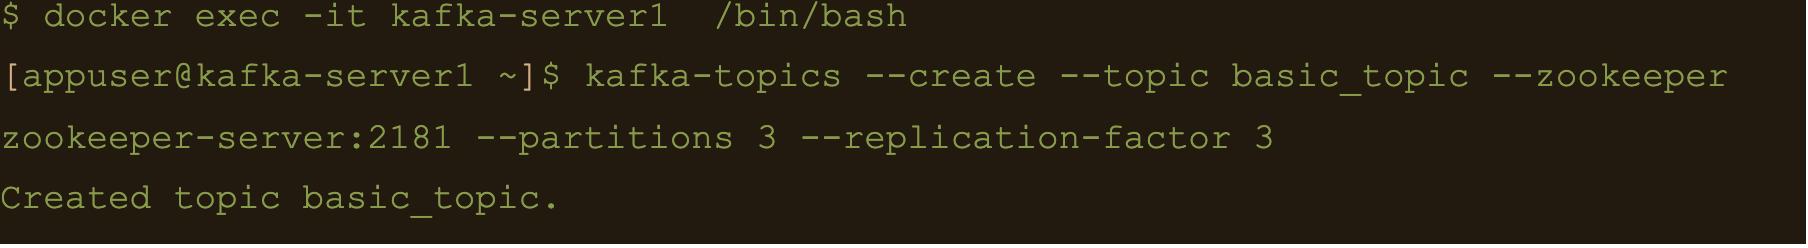 create --topic basic_topic